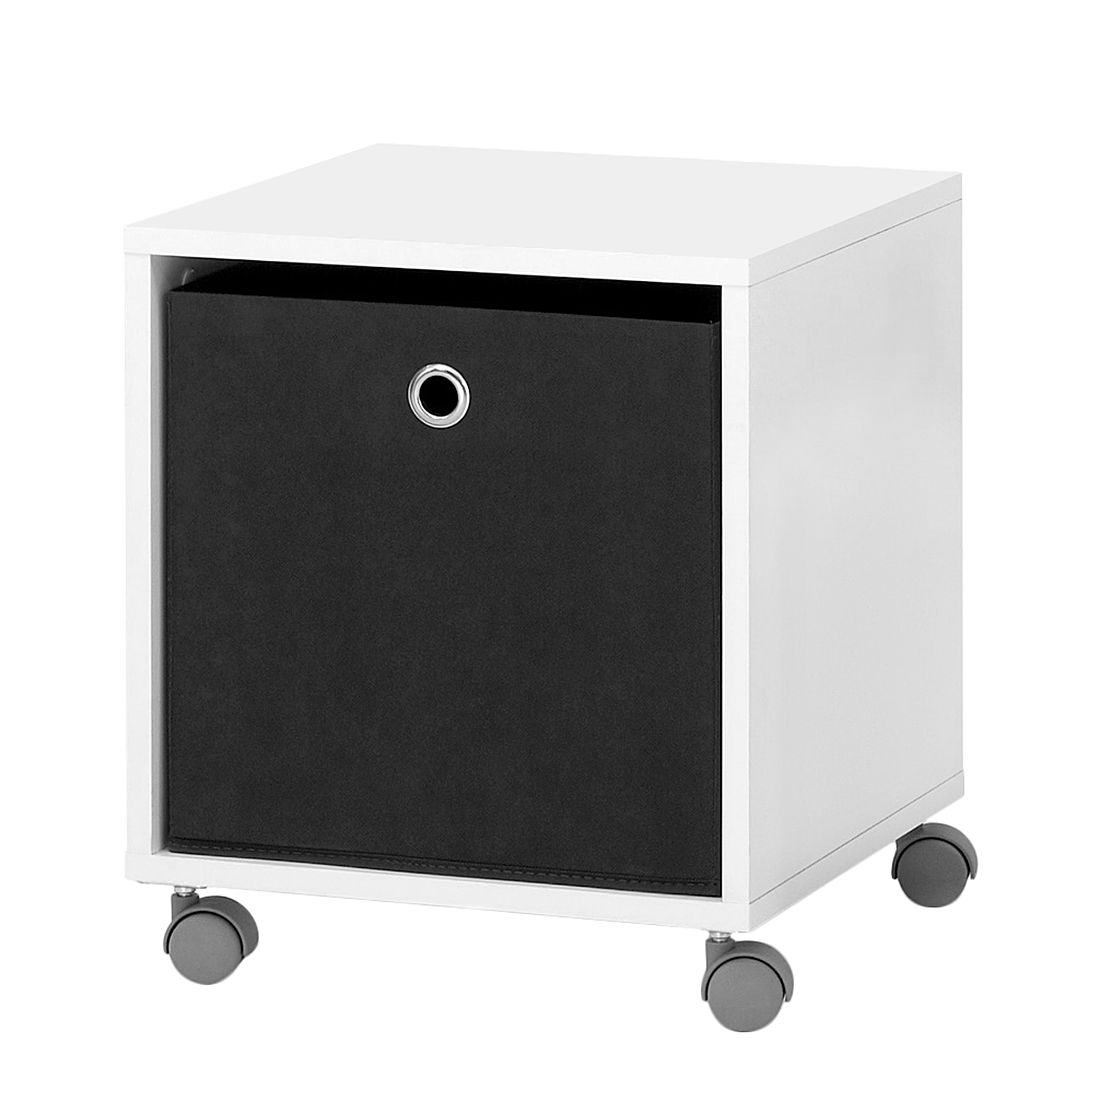 Regalwürfel Dalby (inkl. Faltbox) - Weiß, mooved